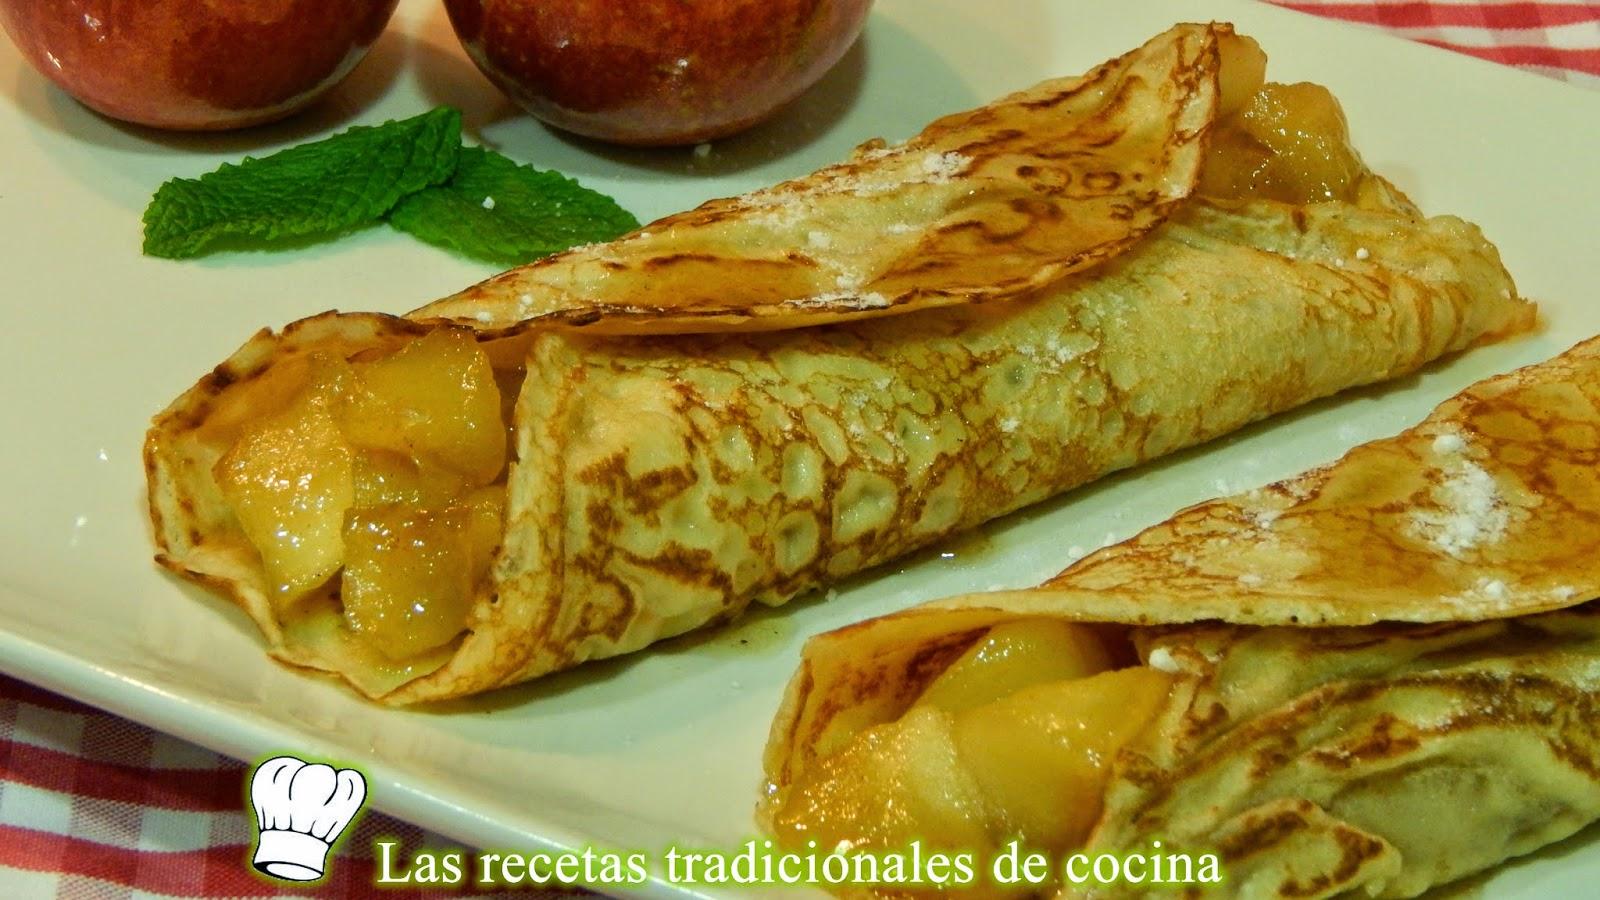 Crepes o tortillas rellenas de manzana